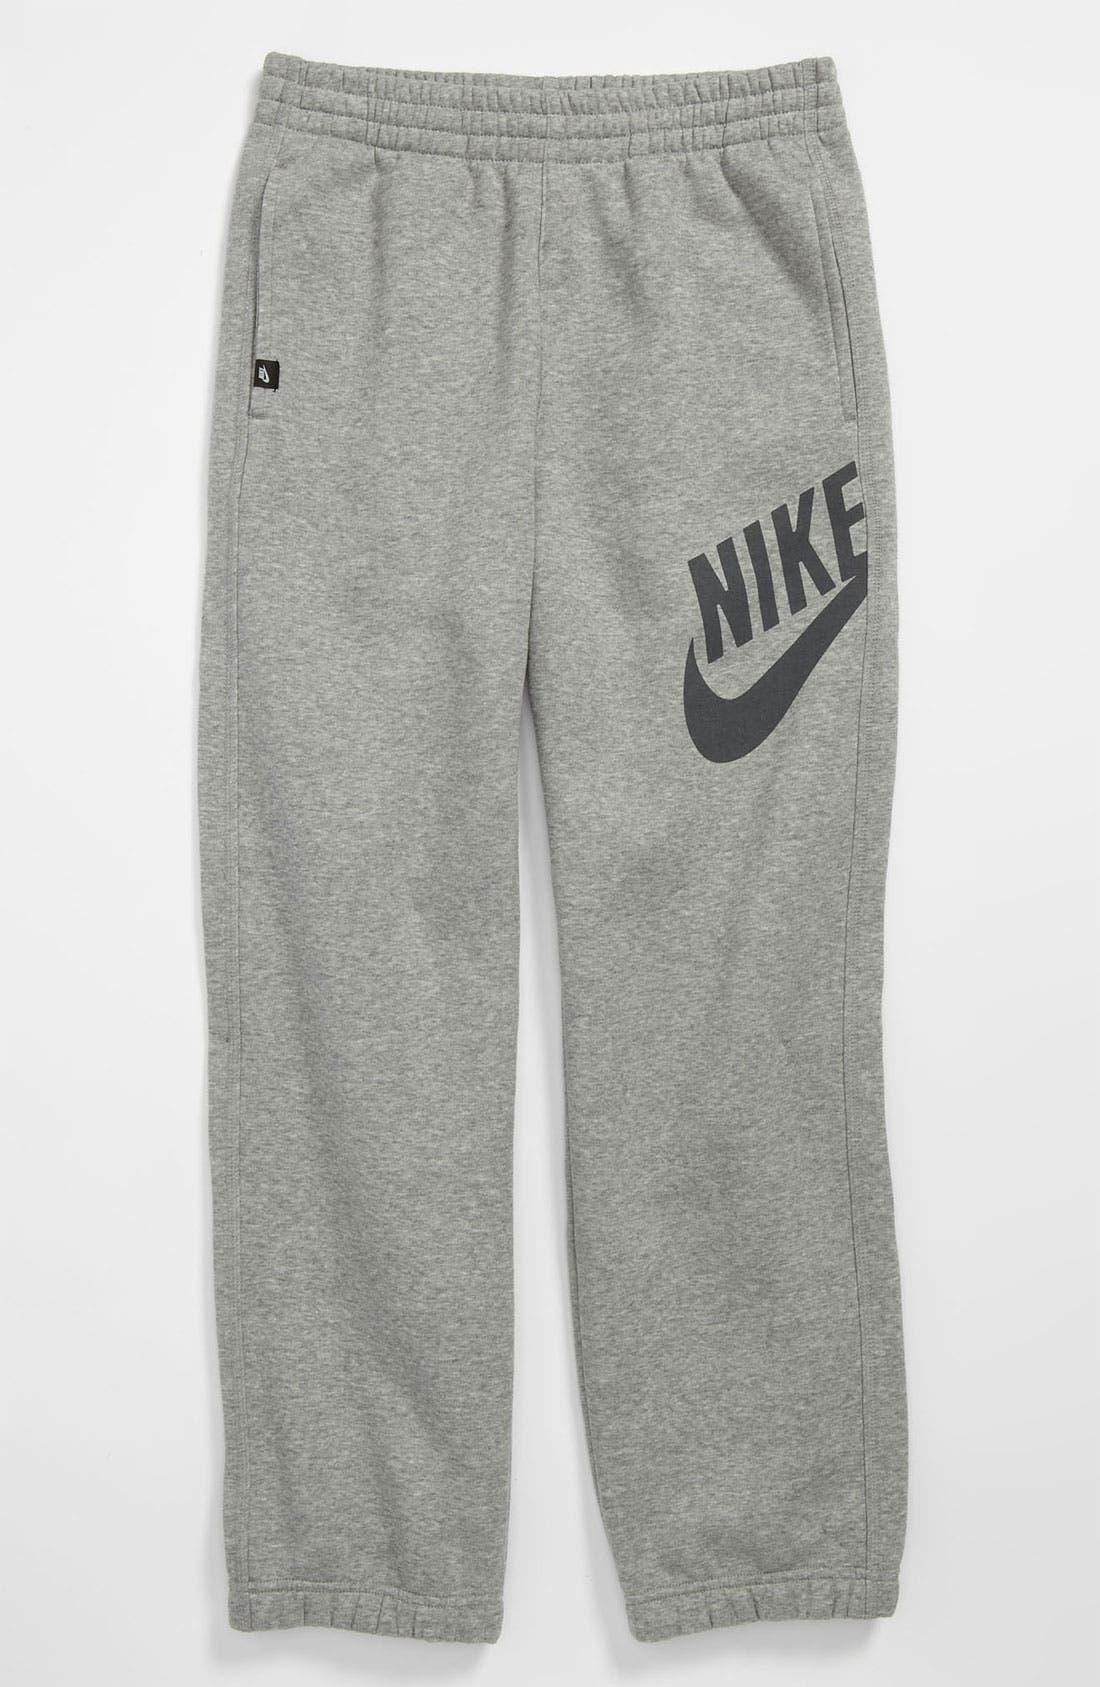 Main Image - Nike 'Limitless' Pants (Big Boys)